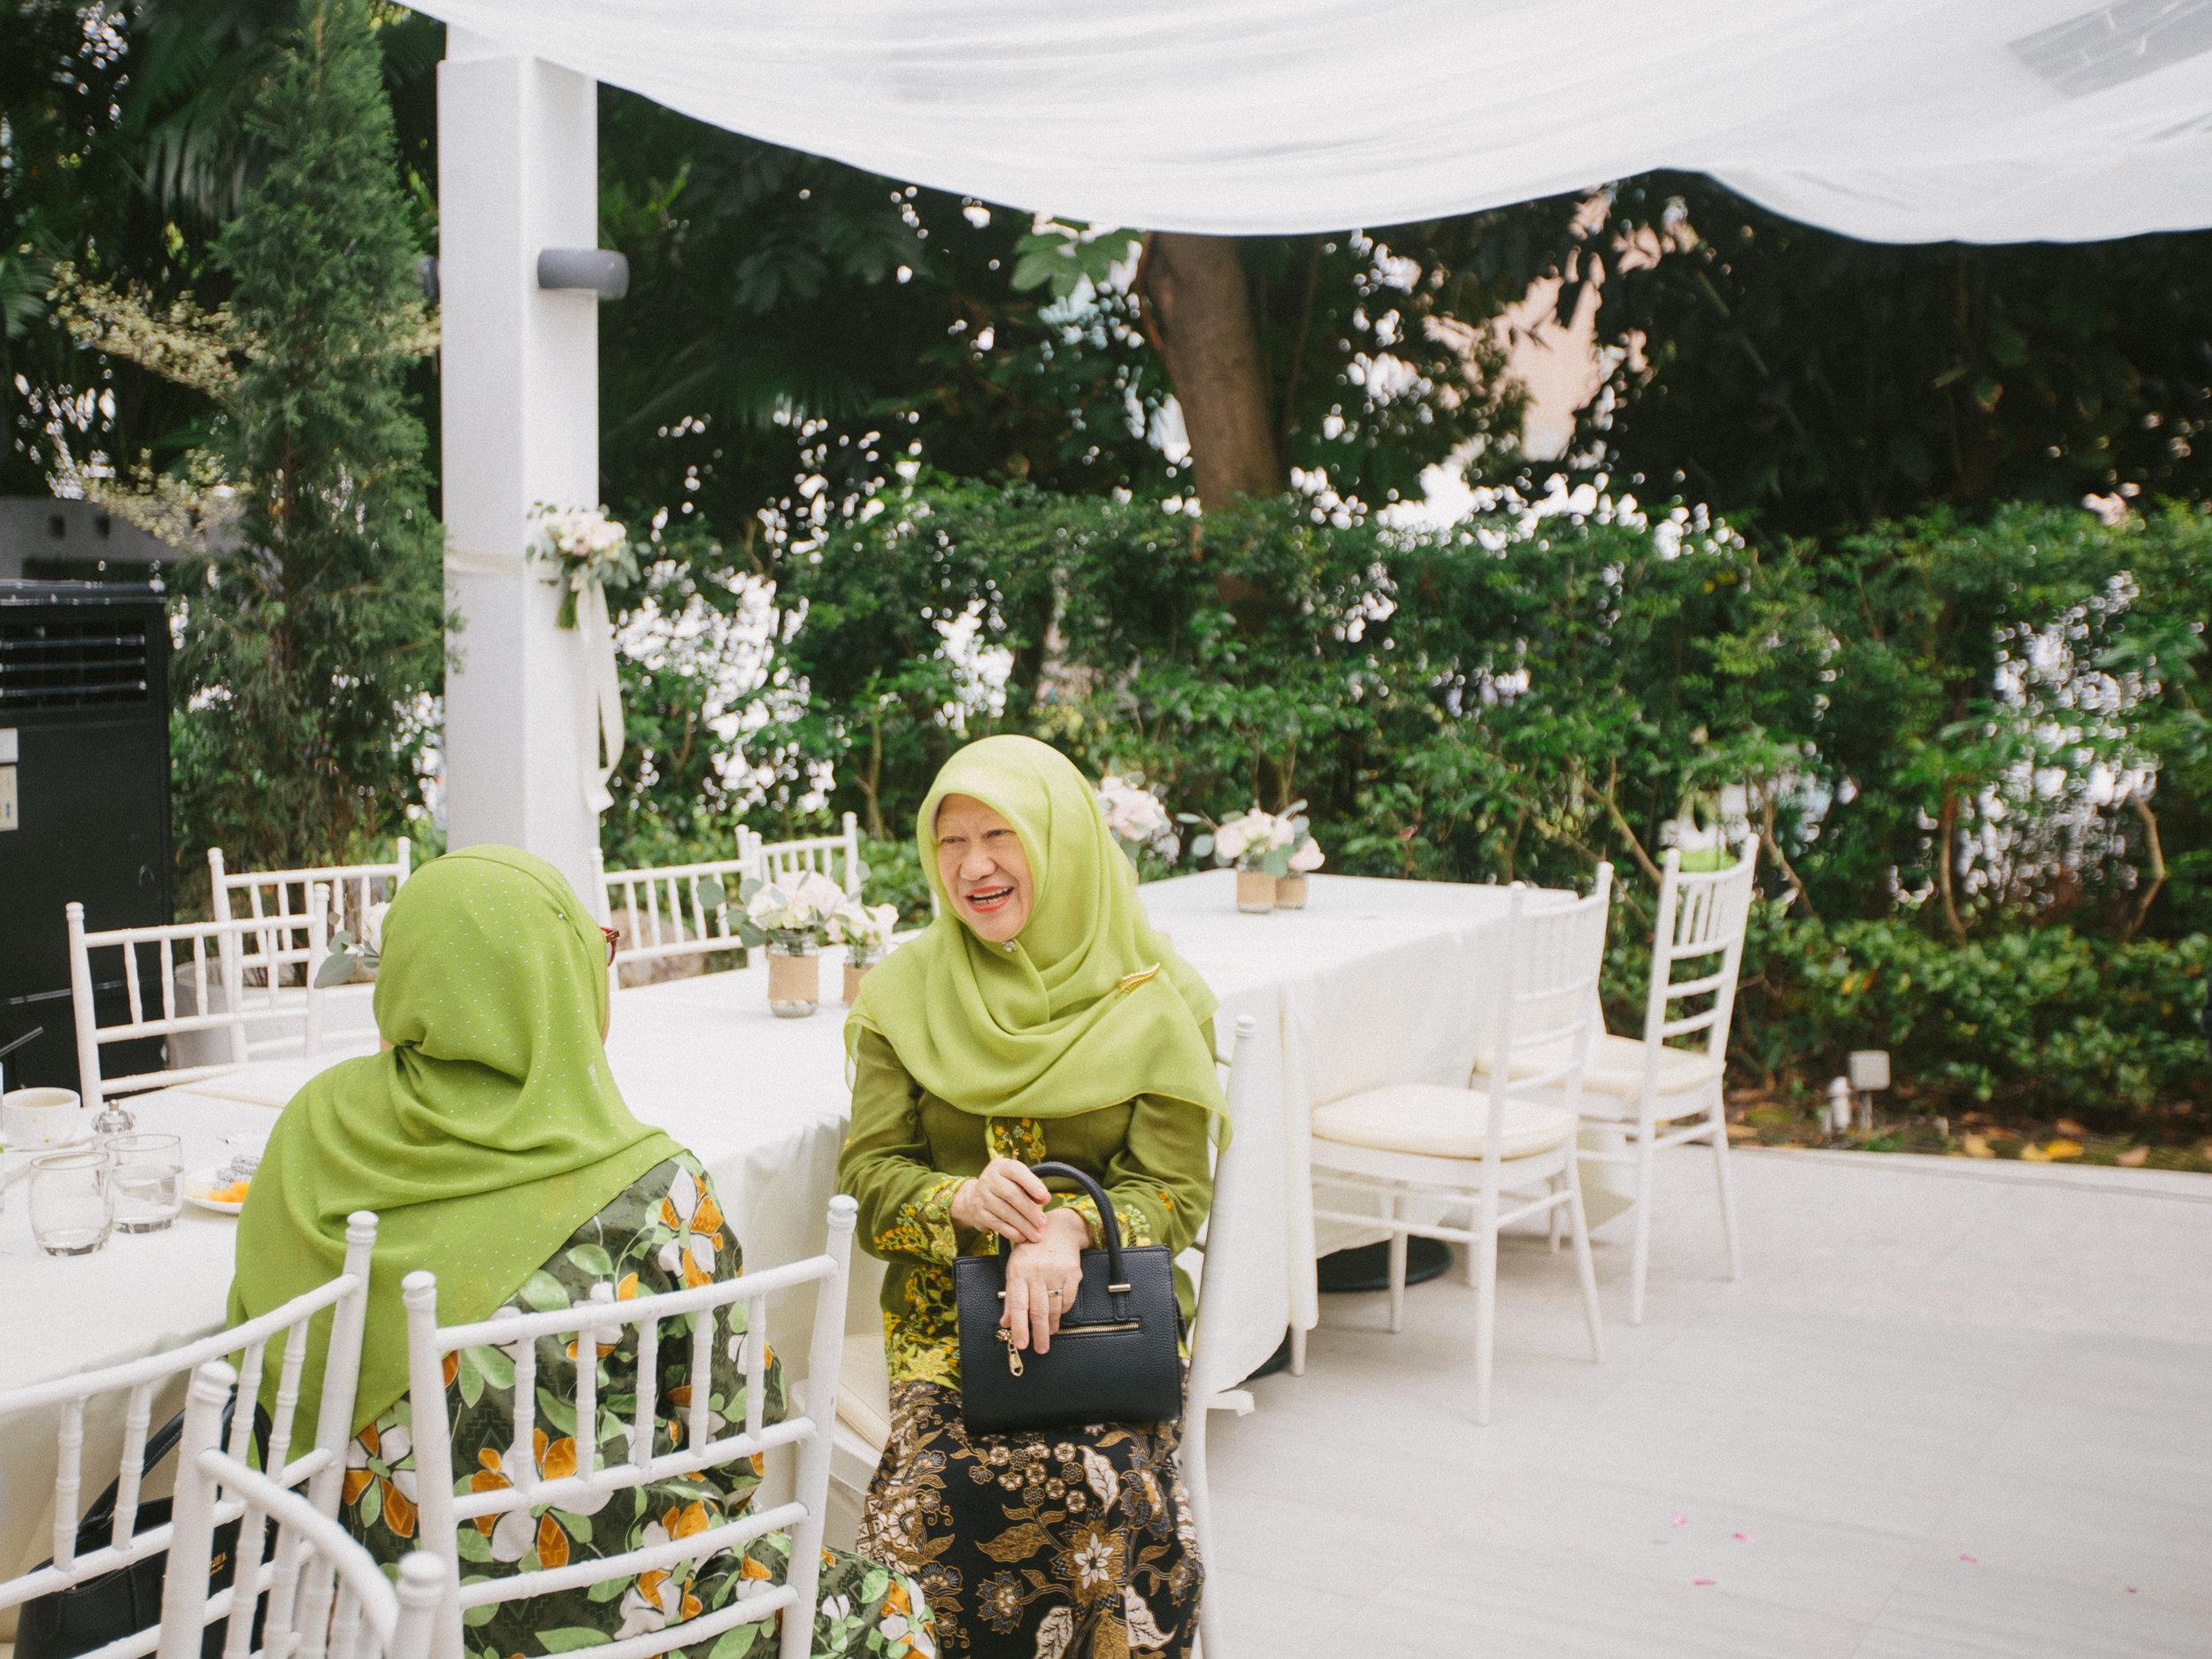 singapore-wedding-photographer-fadilah-kwan-071.jpg